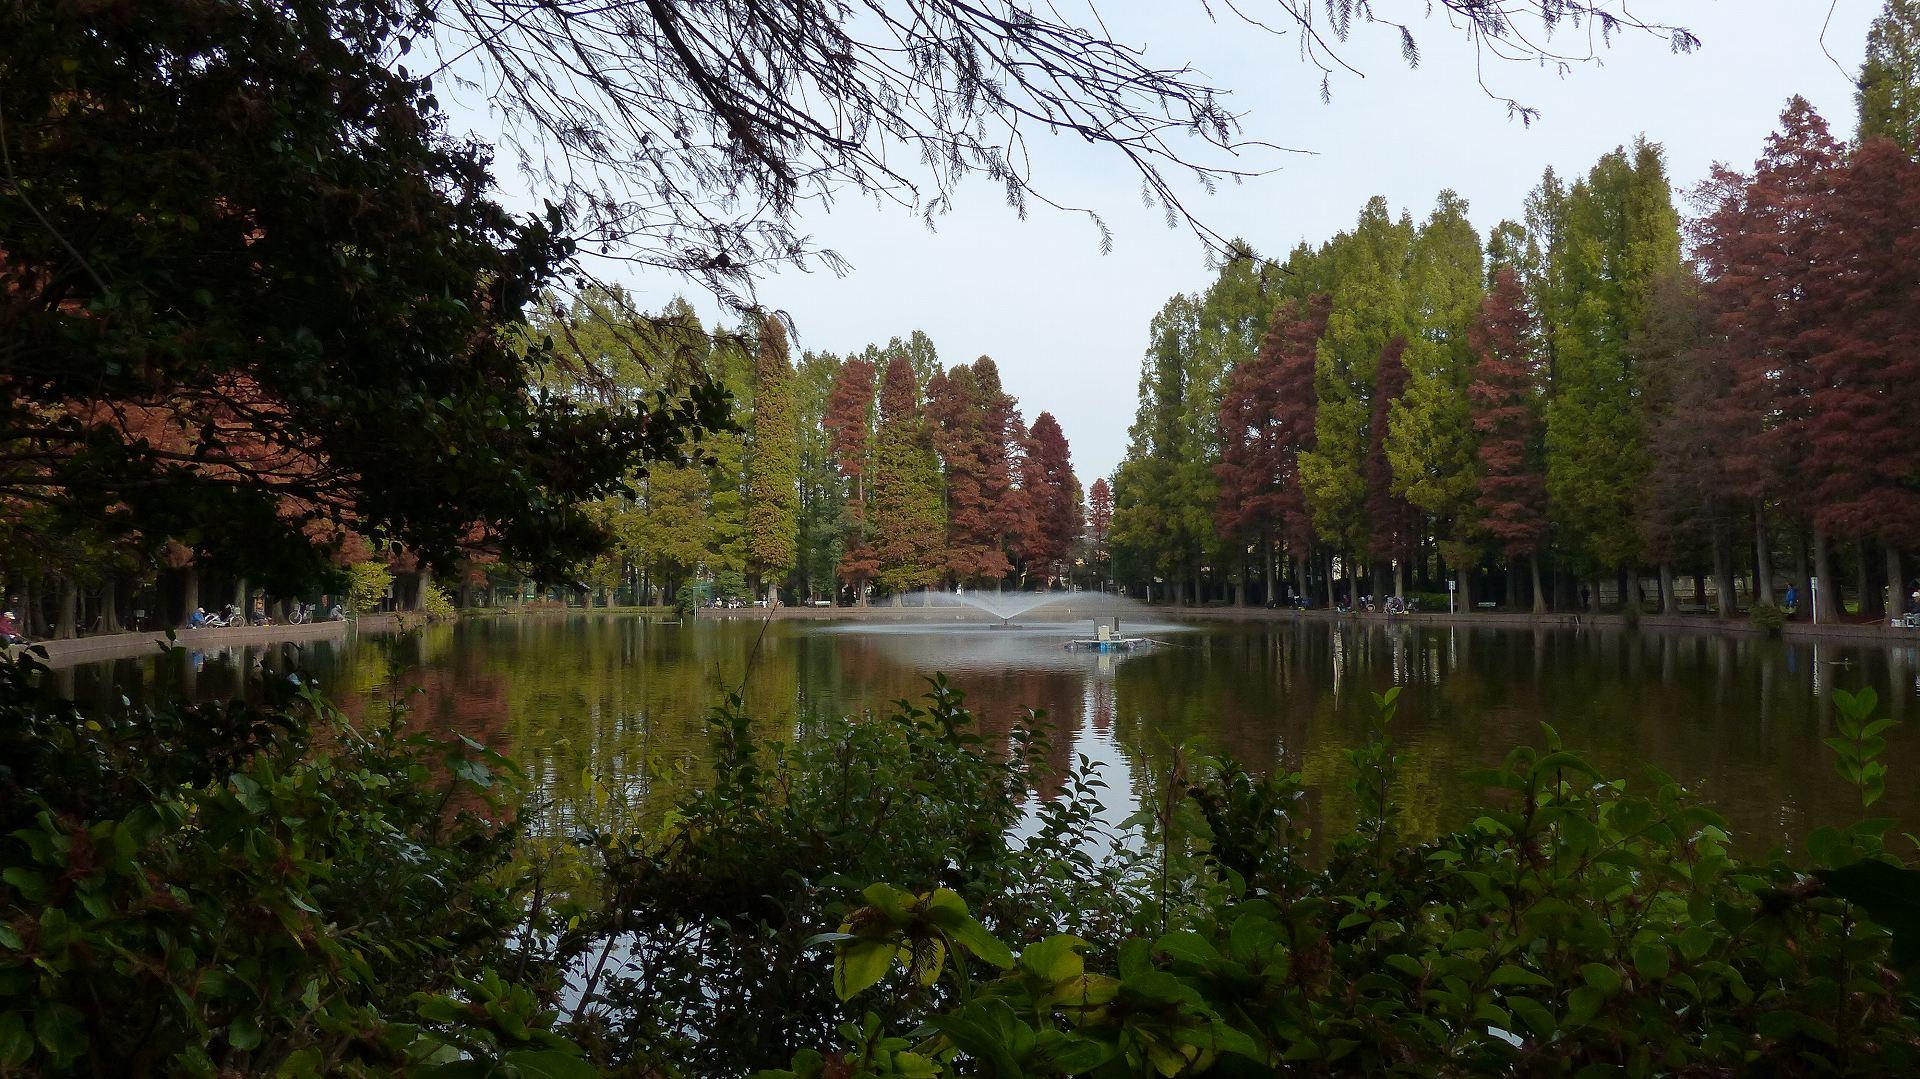 秋色の金黒羽白鴨_a0185081_1450799.jpg